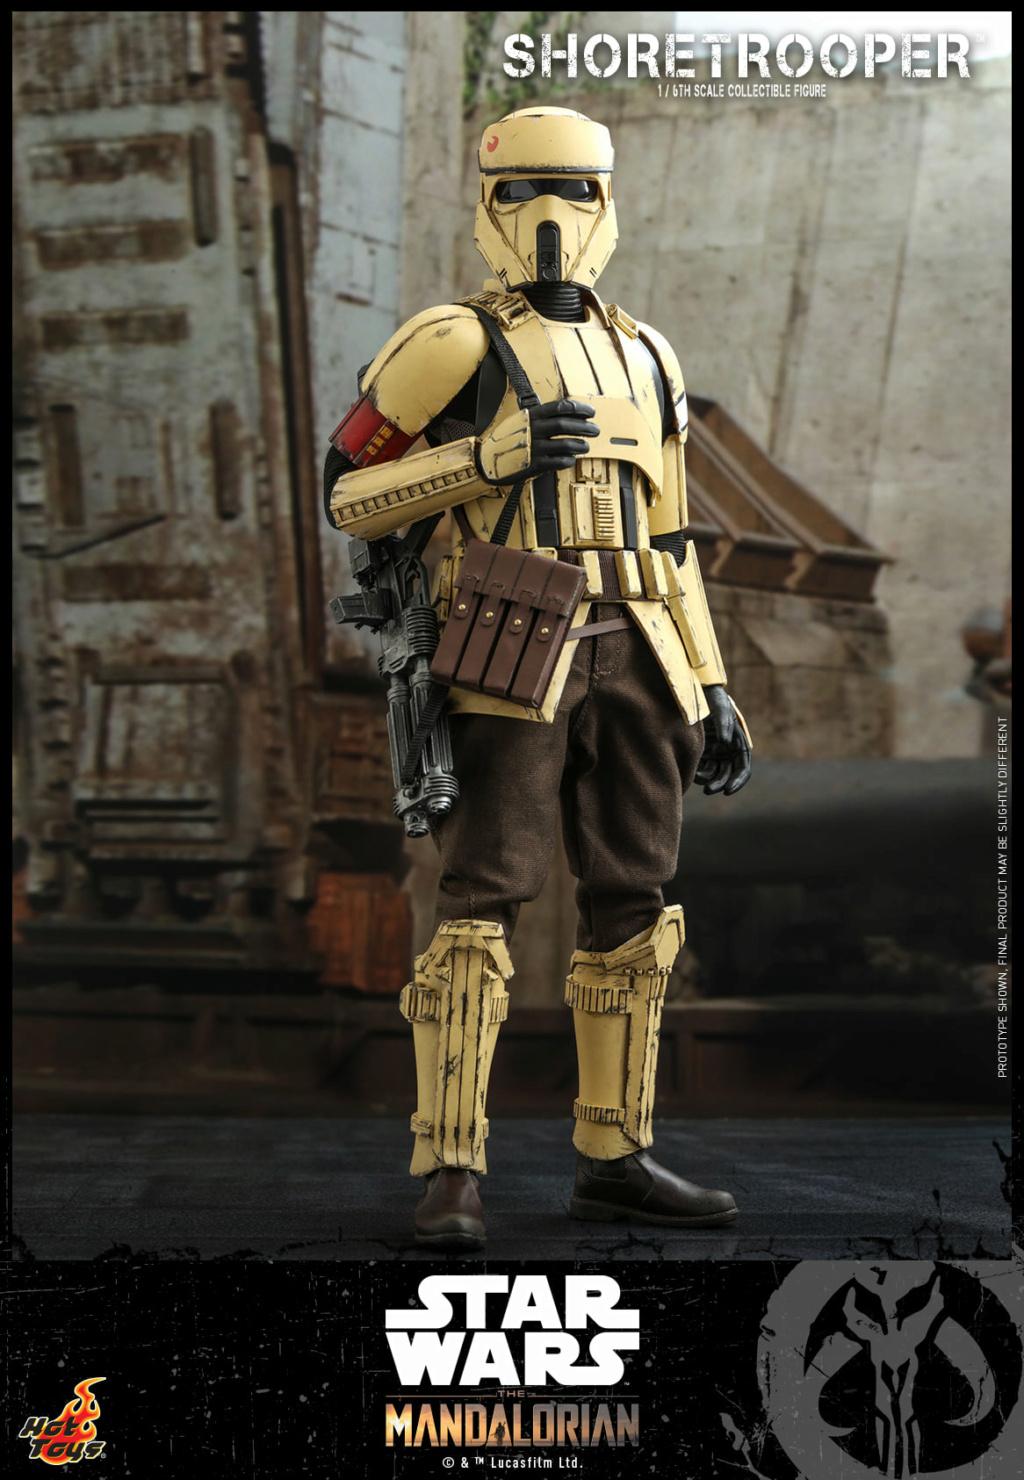 Shoretrooper 1/6 Collectible Figure The Mandalorian Hot Toys Shoret15